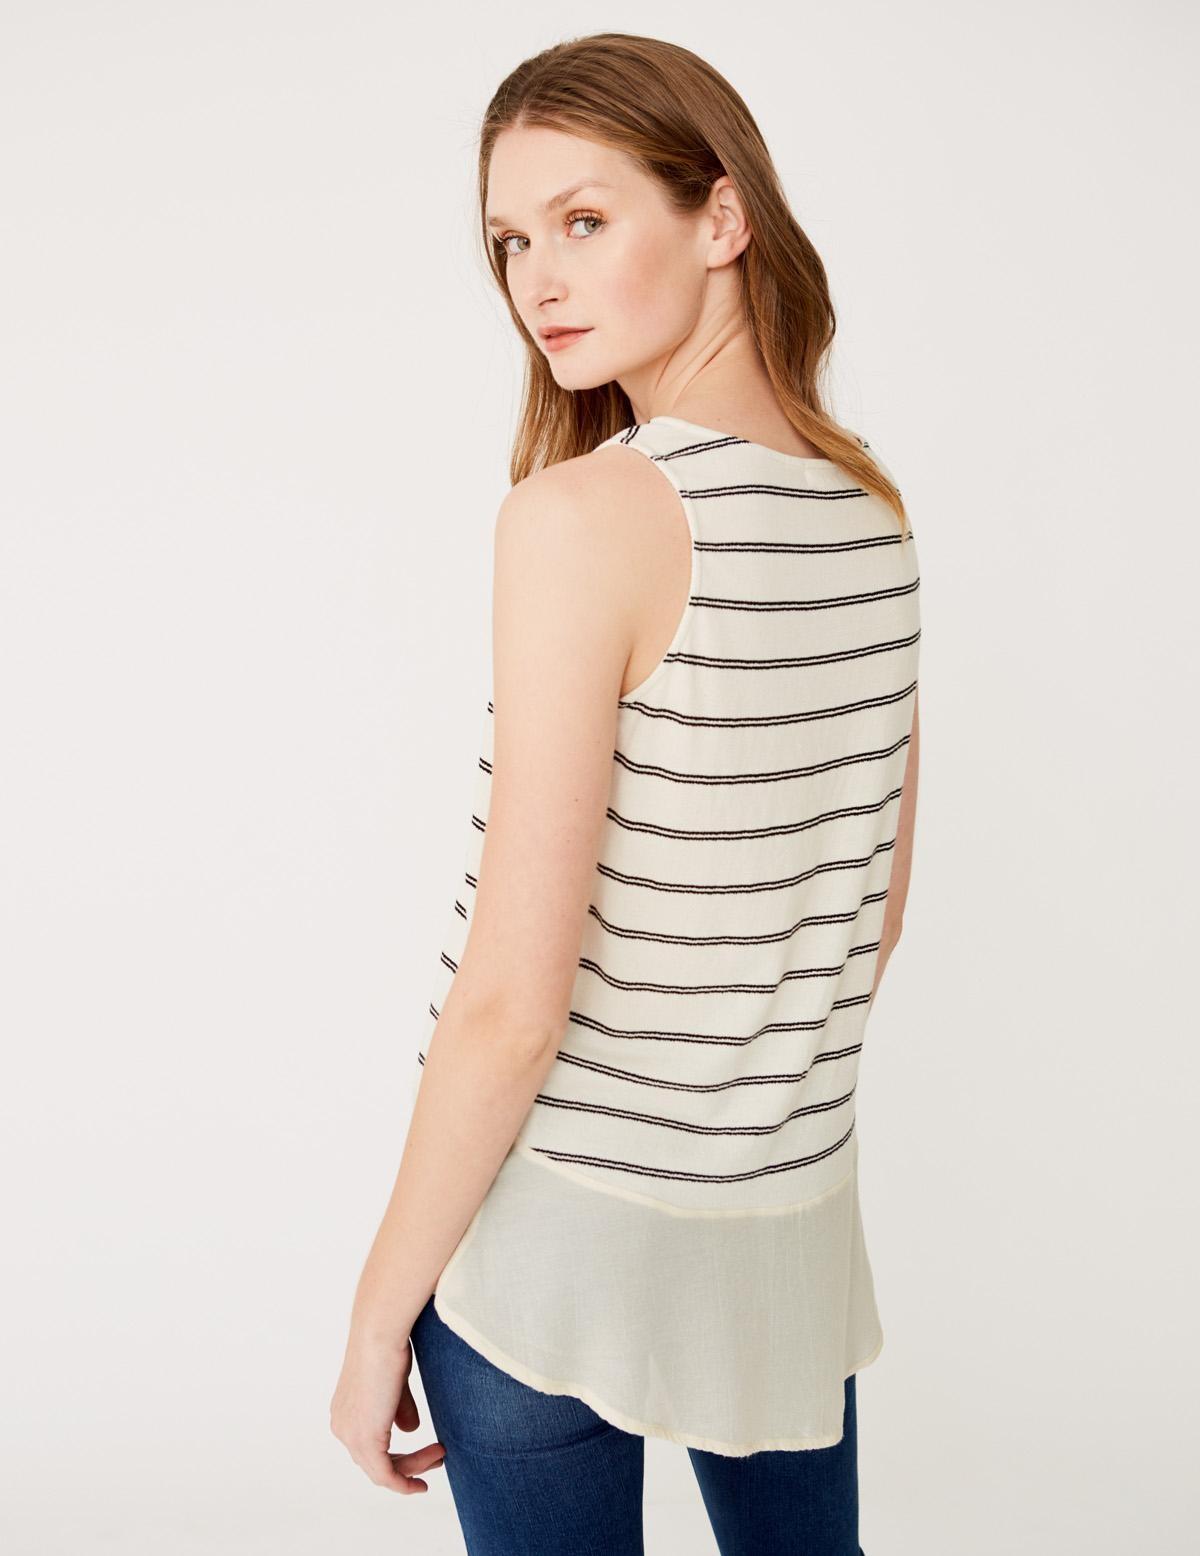 Camiseta sin mangas rayas - Ítem1